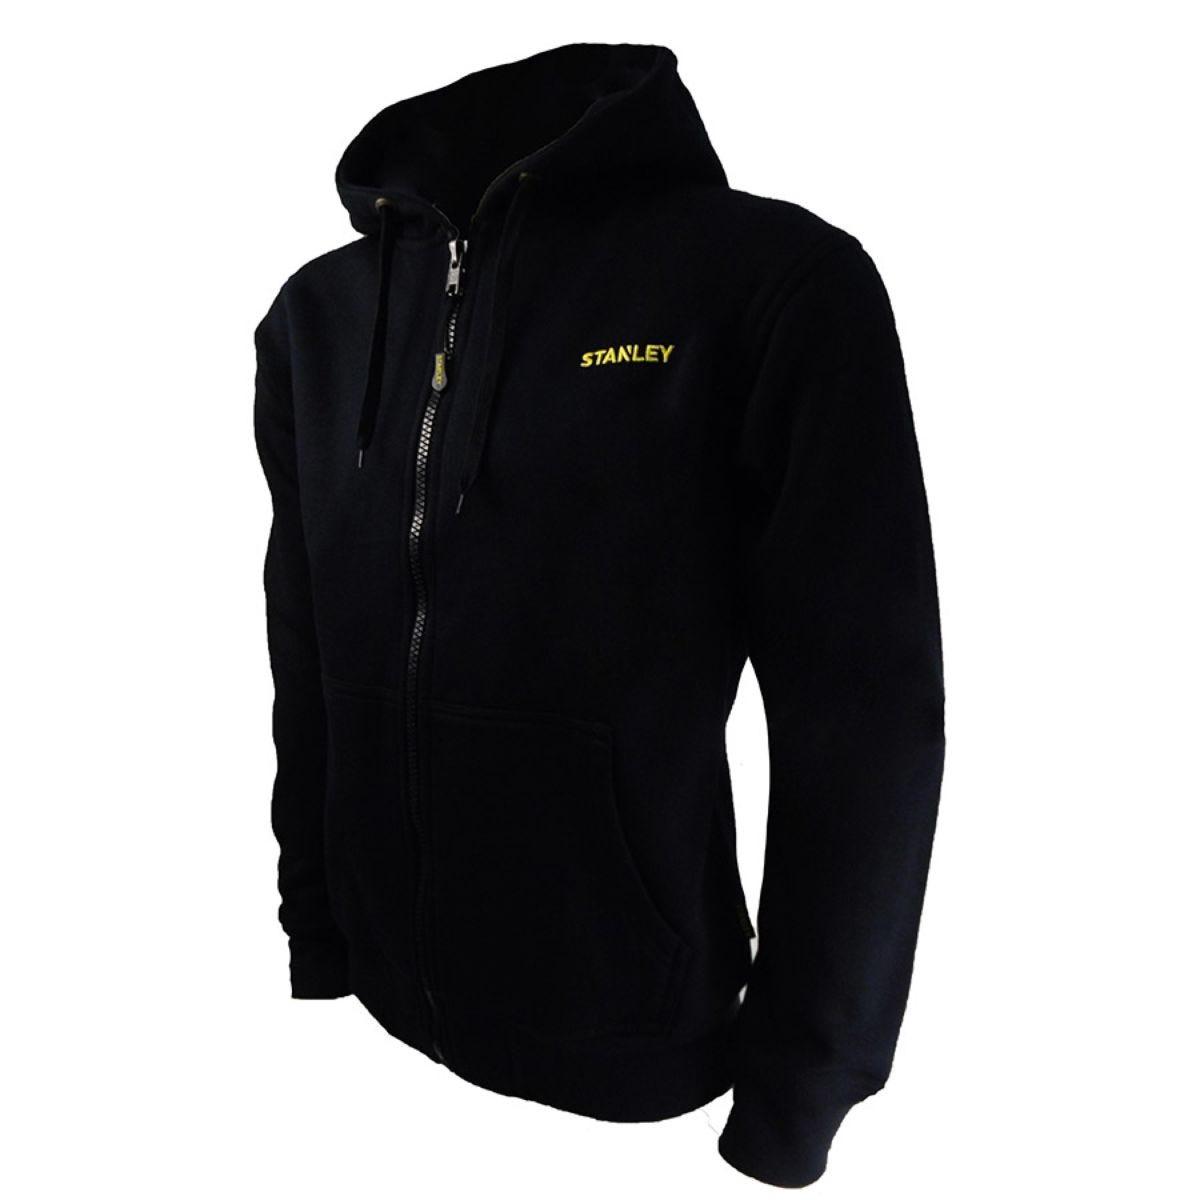 Stanley Workwear Maine Hooded Work Fleece - Black